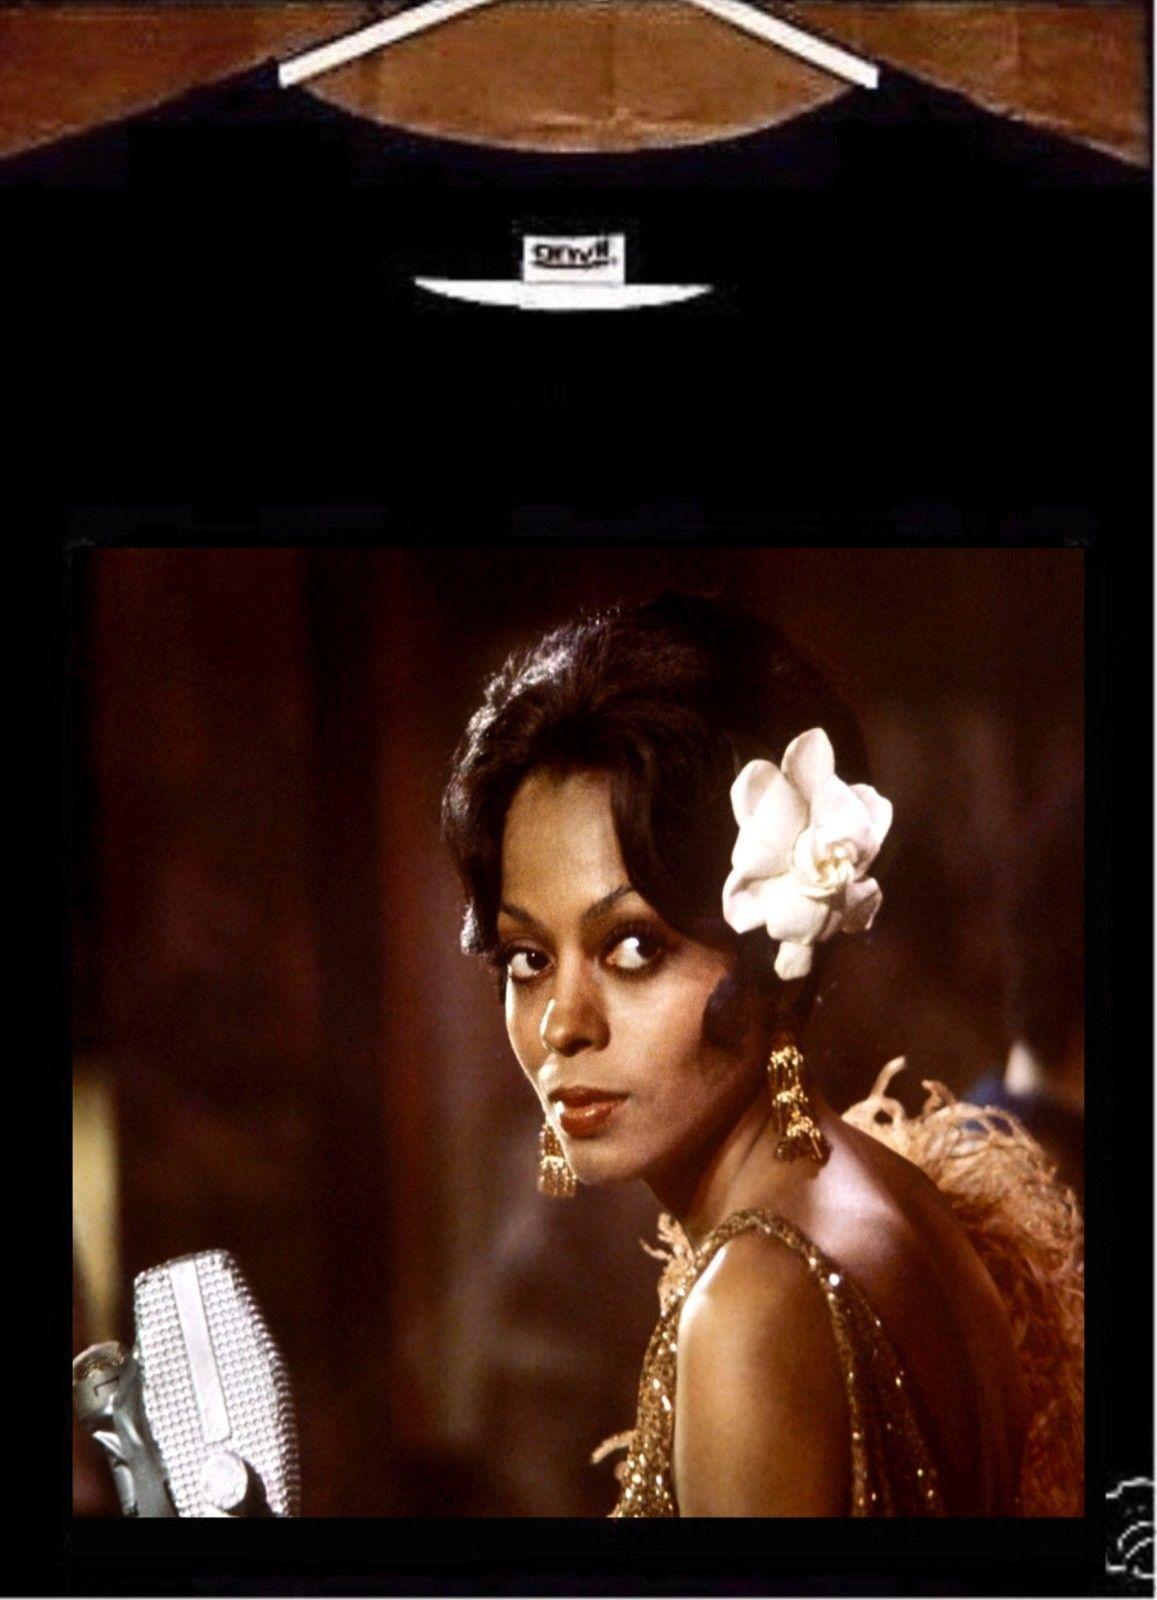 595f020bdff40 Diana Ross T shirt; Diana Ross Lady Sings The Blues Tee Shirt free shipping  Unisex Casual gift